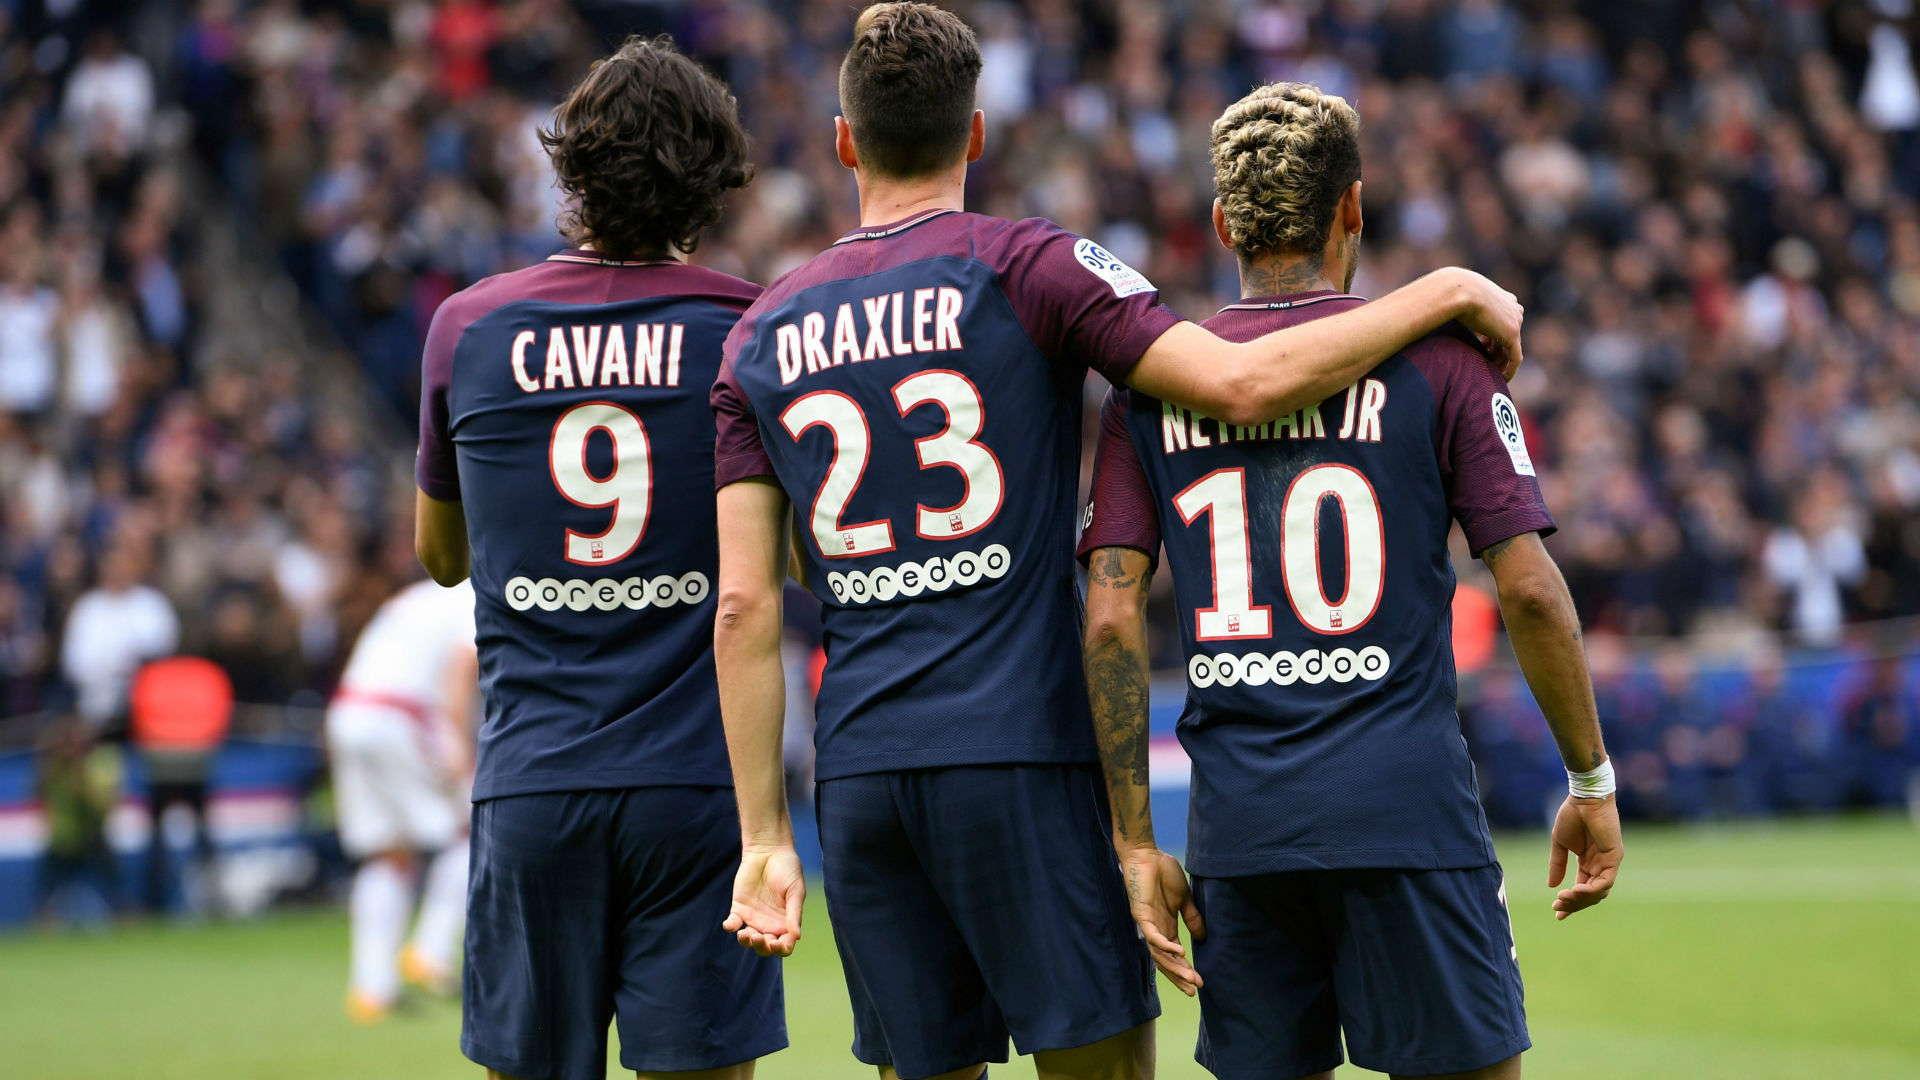 Draxler : Neymar Memiliki Keterampilan Hebat